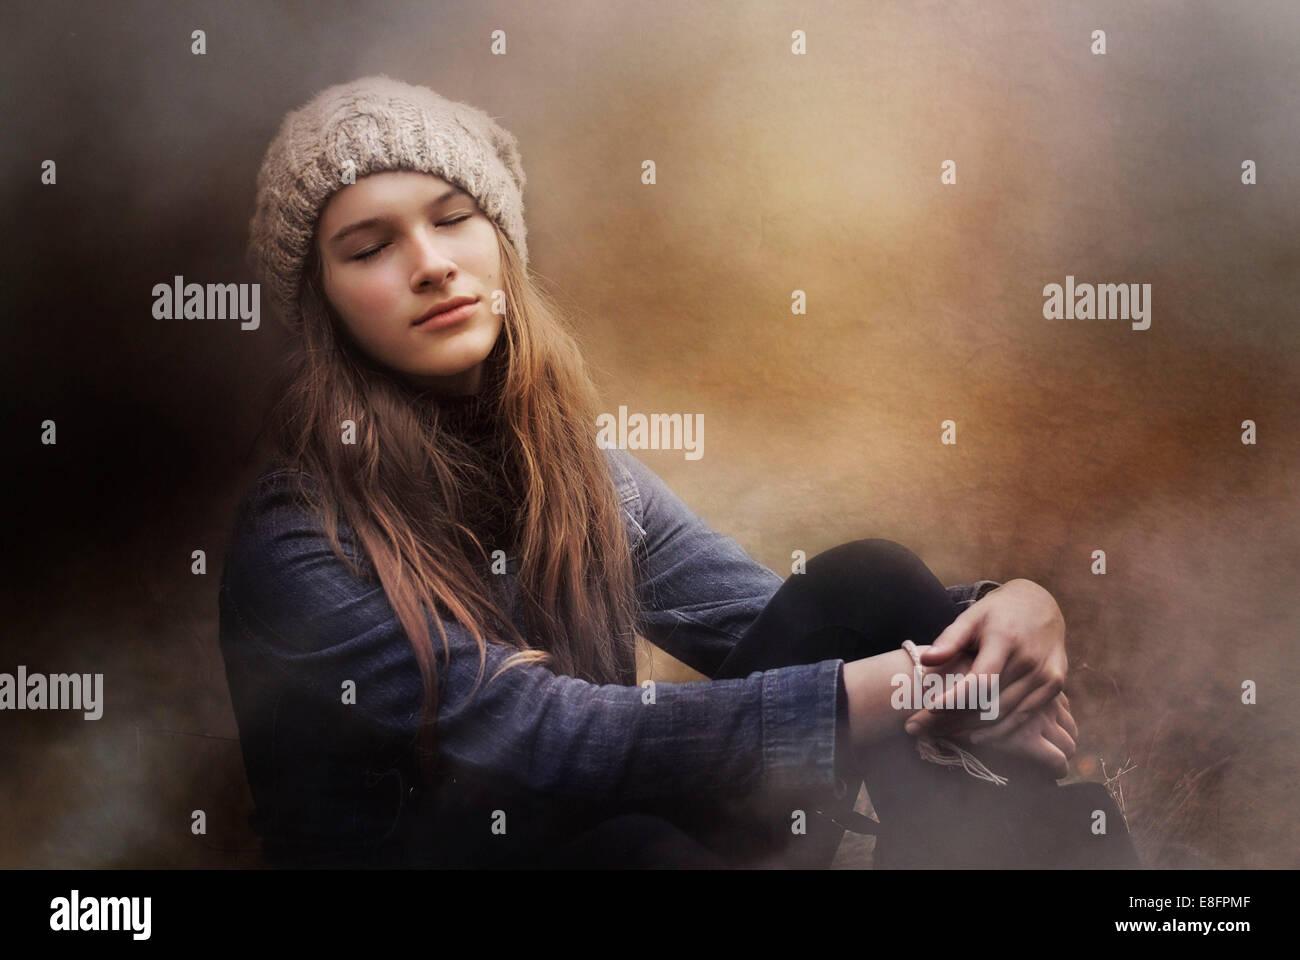 Teenage girl day dreaming Photo Stock